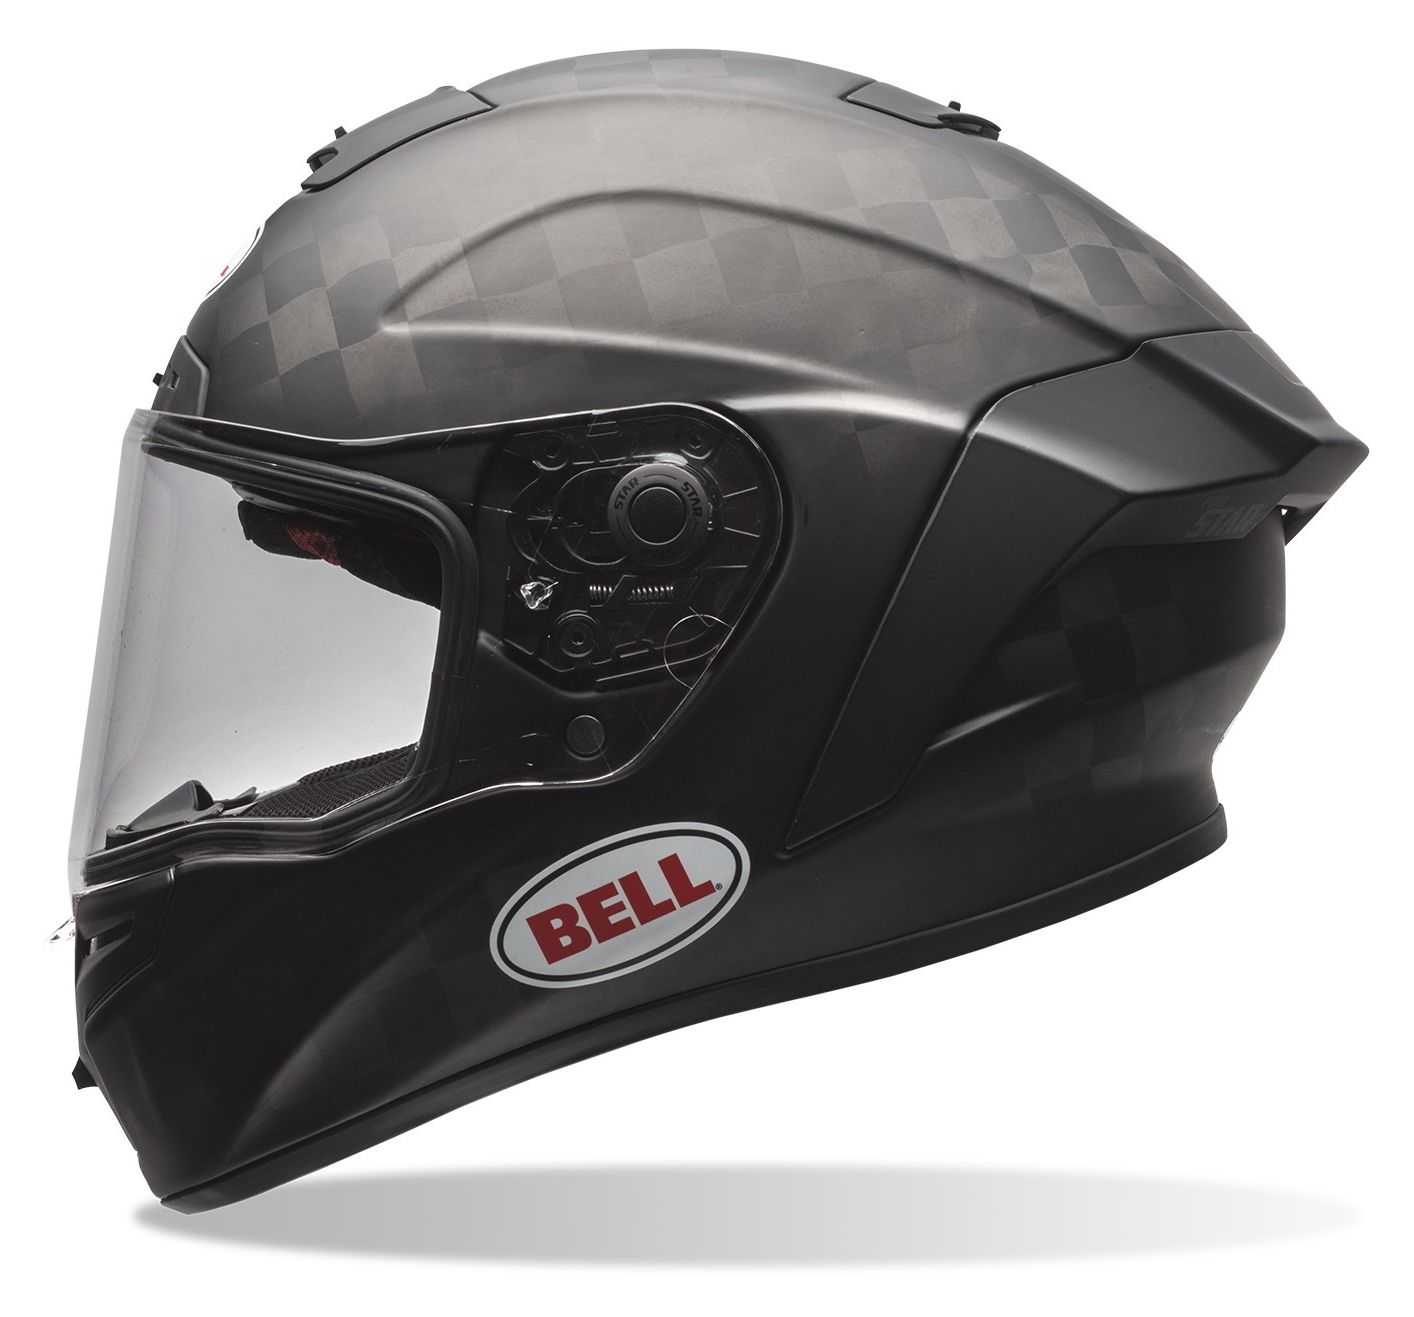 41ff4fc0 Bell Pro Star Motorcycle Helmet - Cycle Gear